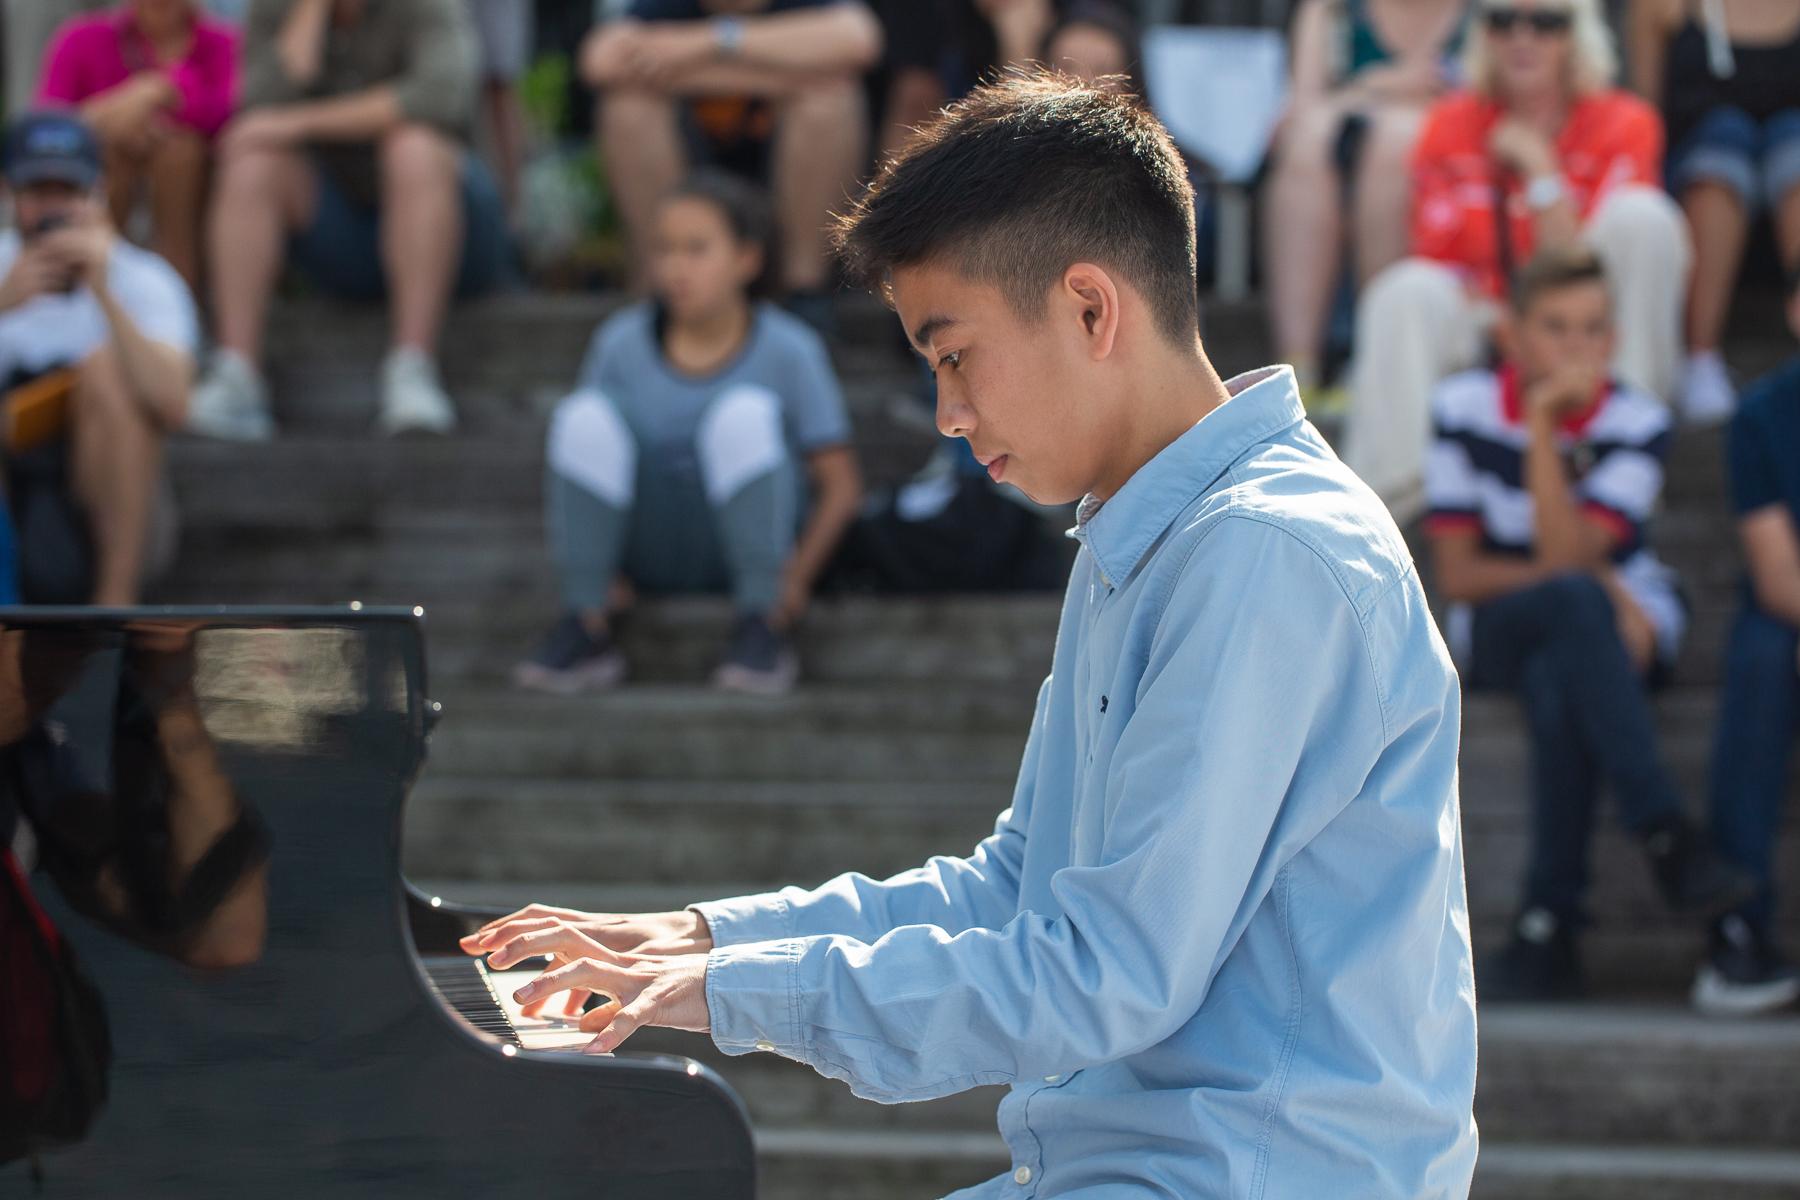 Parkert Piano_23 24 25 aug_@jonasmeek-149.jpg